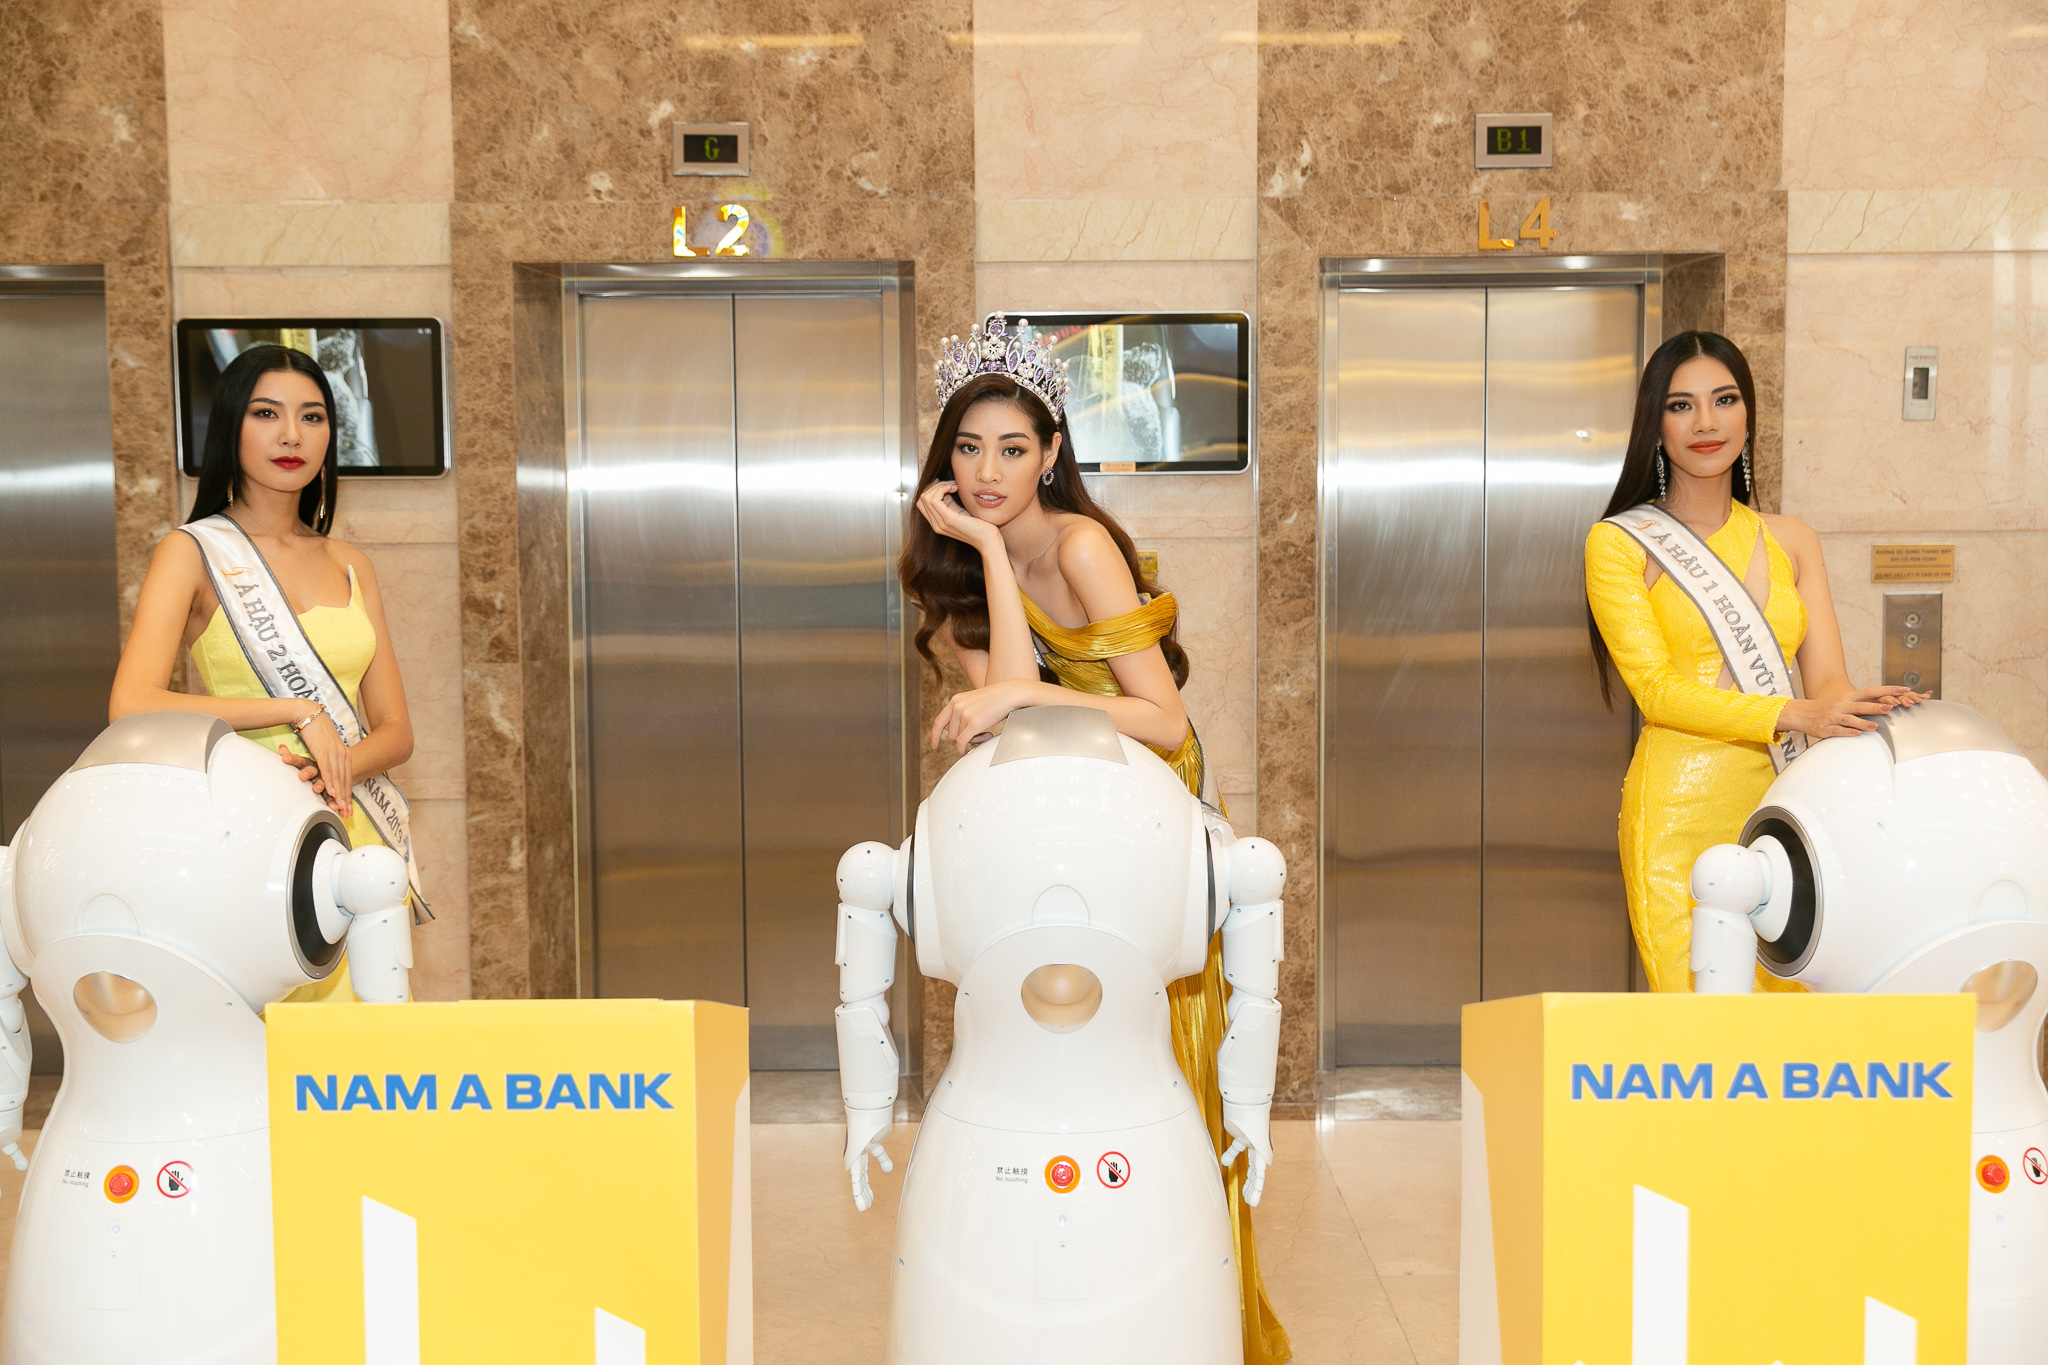 Top 3 Hoa Hau Hoan Vu Viet Nam 2019_Event Nam A Bank (56)